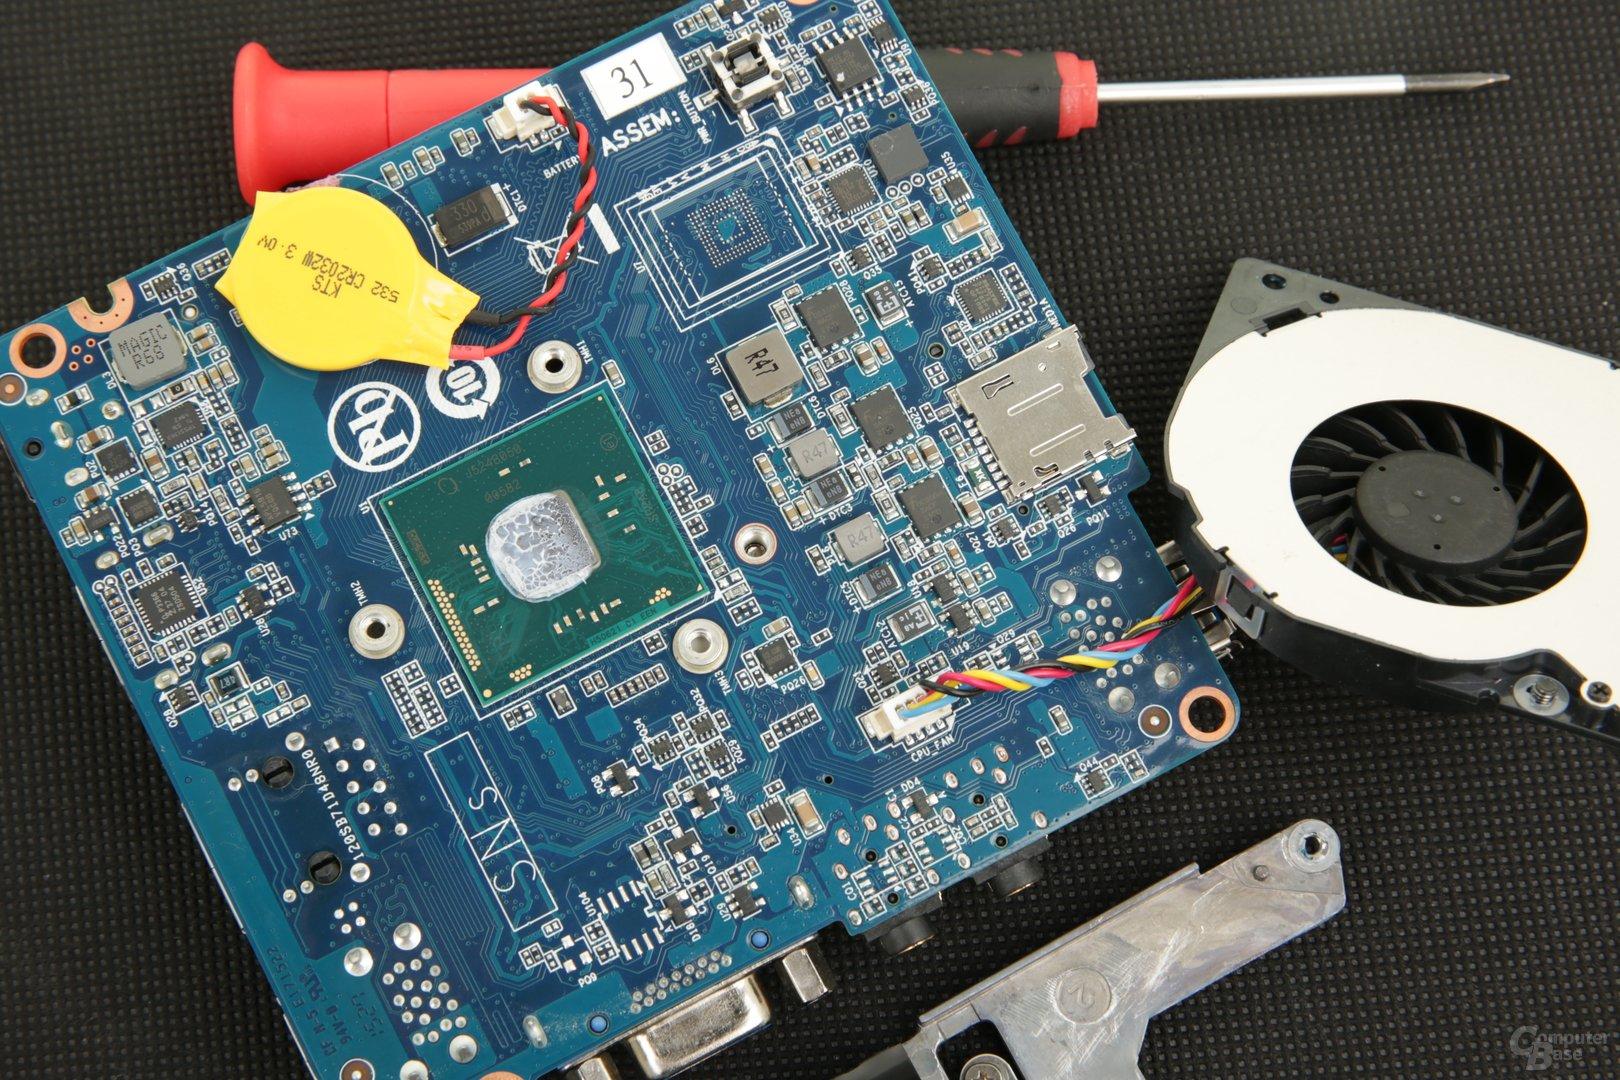 Gigabyte Brix GB-BACE-3150 mit aktiver Kühlung